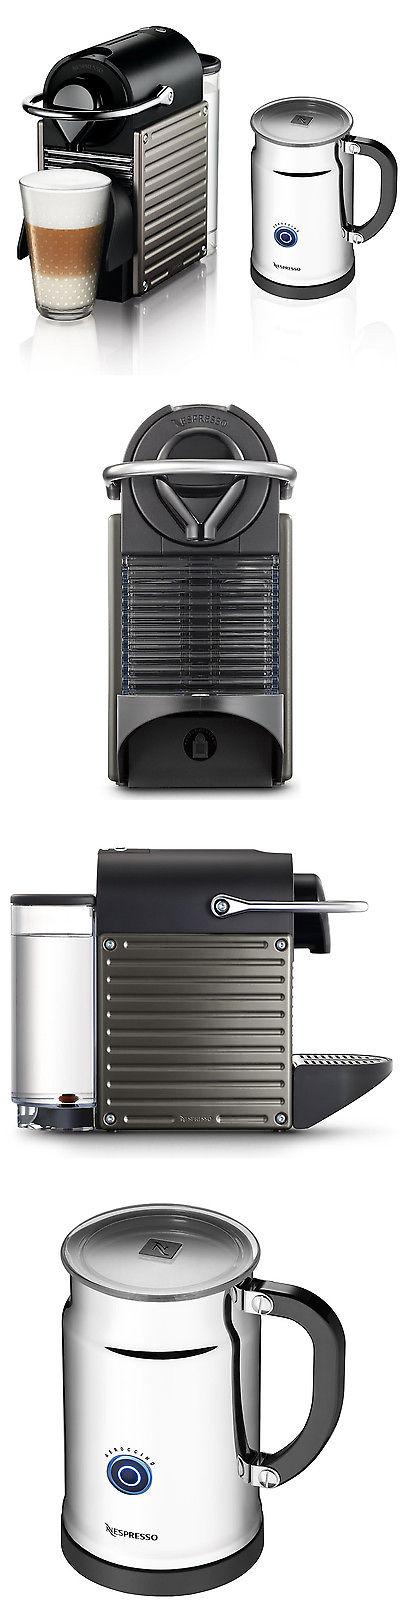 Espresso Machines 38252: Nespresso Pixie Espresso Maker With ...